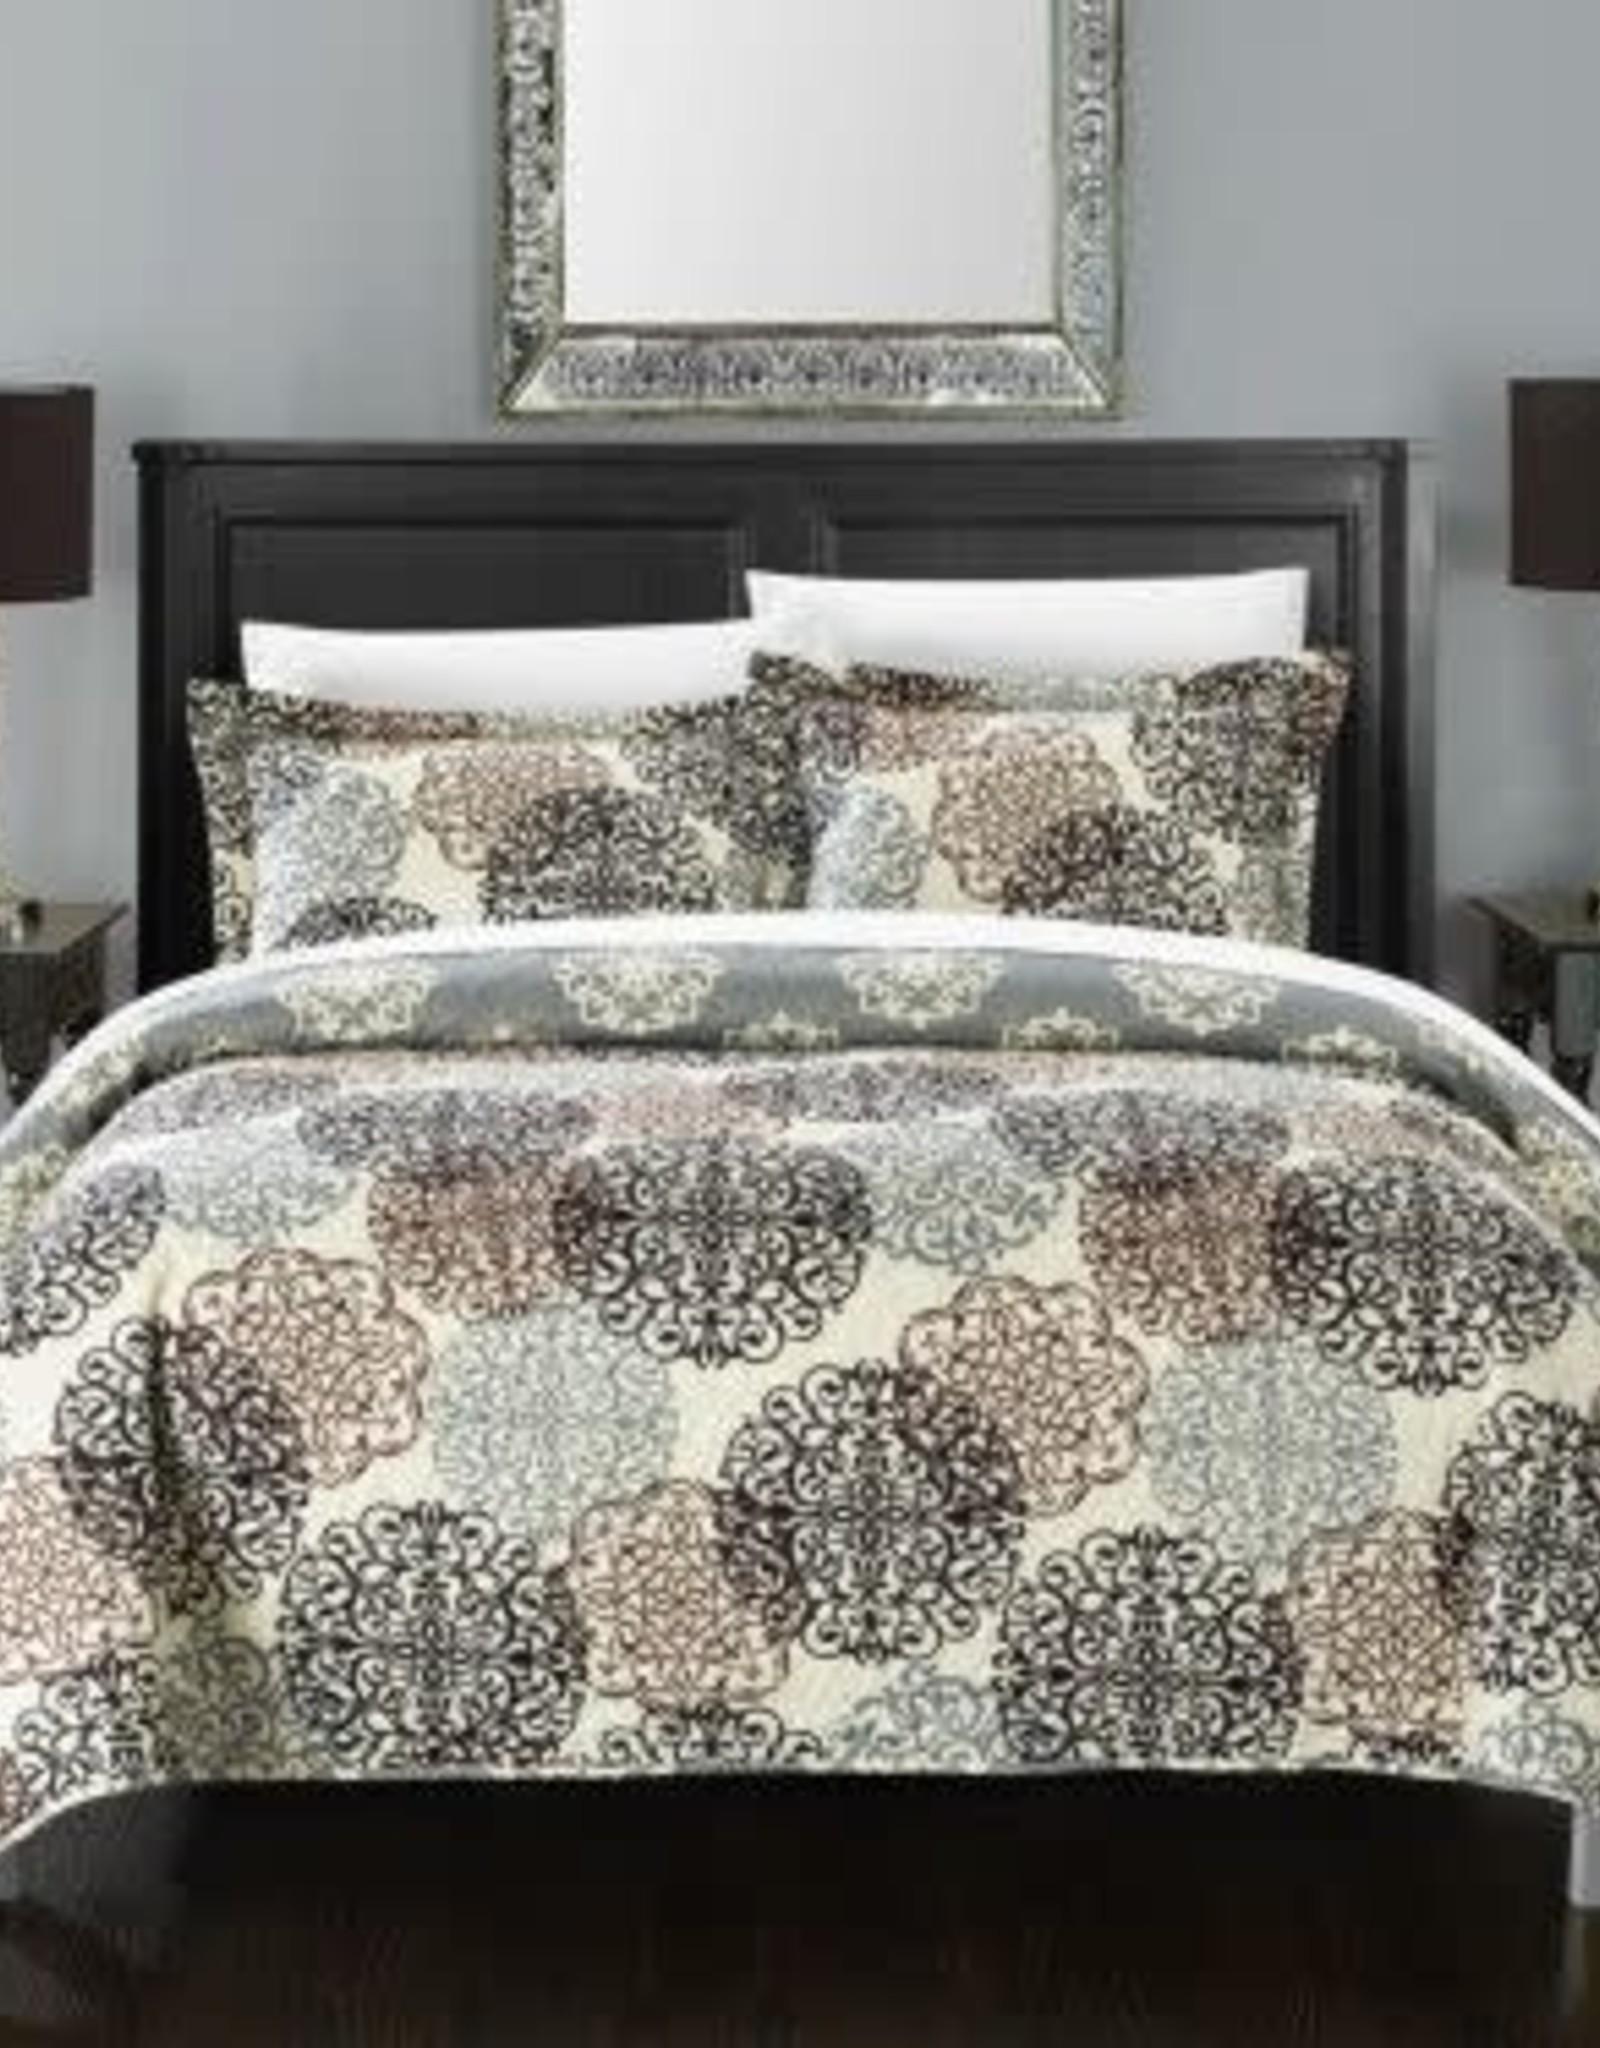 CHIC HOME DESIGN LLC Chic Home Queen 3 Piece Reversible Print Quilt Set